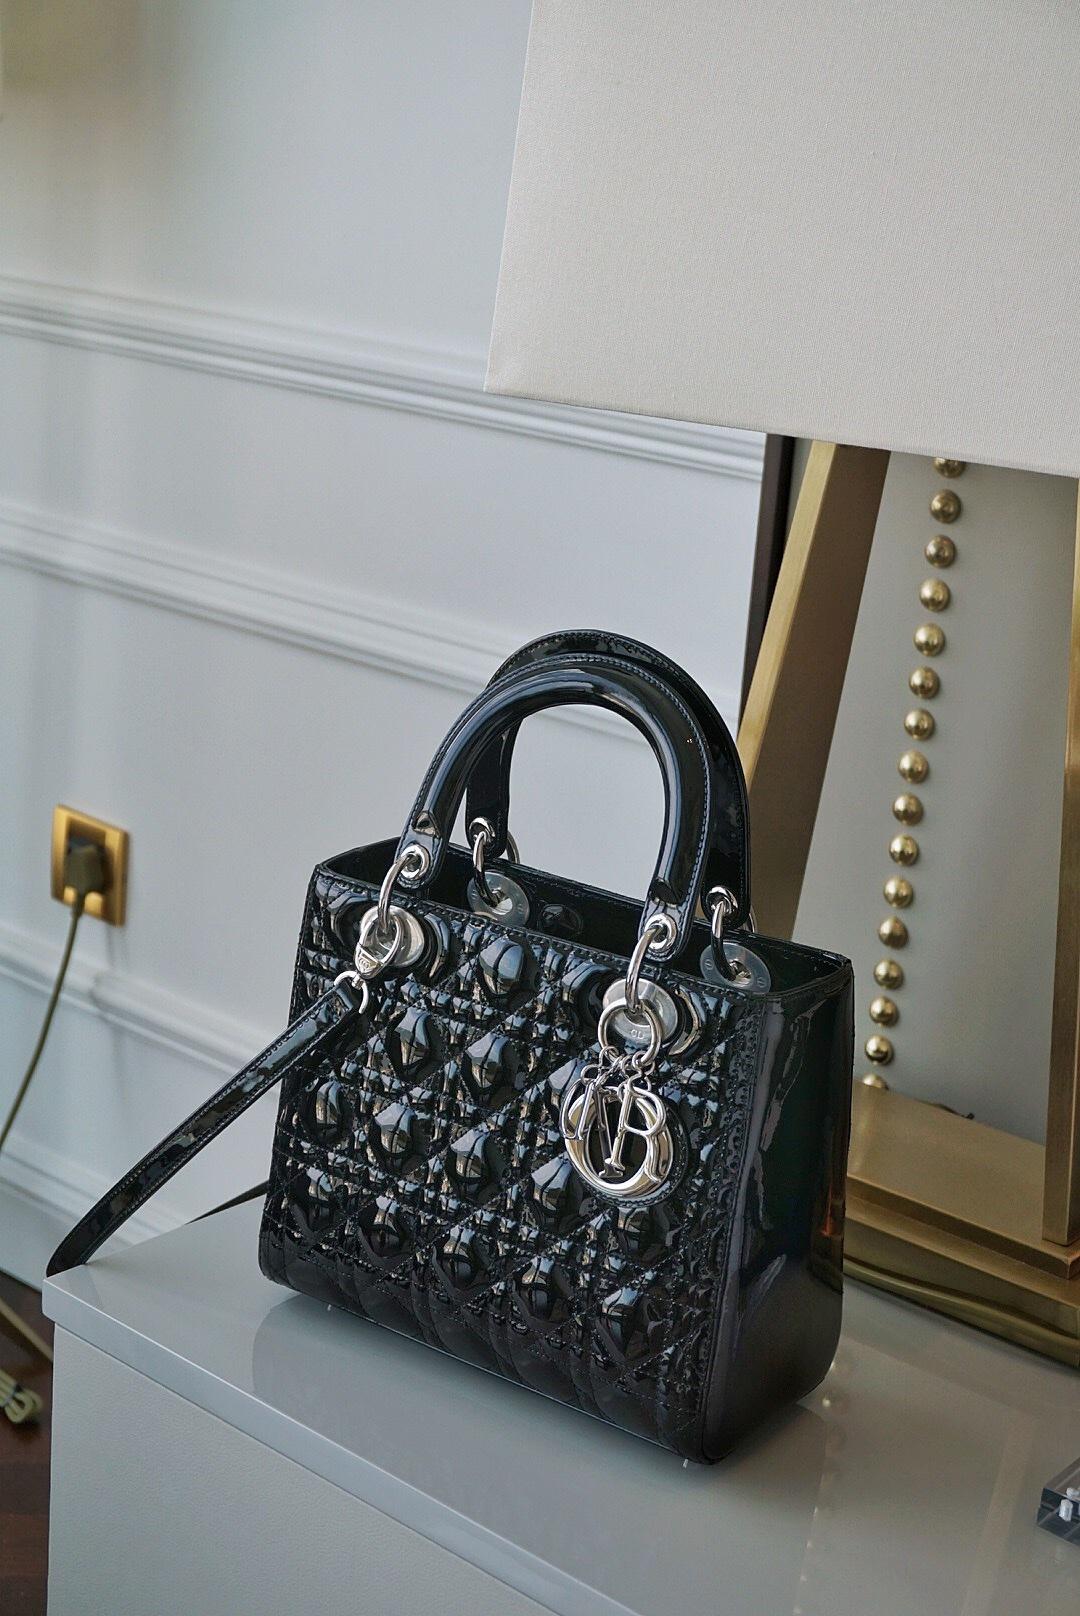 Dior 迪奥 戴妃包 Lady Dior 五格 24cm 黑色 -牛漆皮戴妃包-